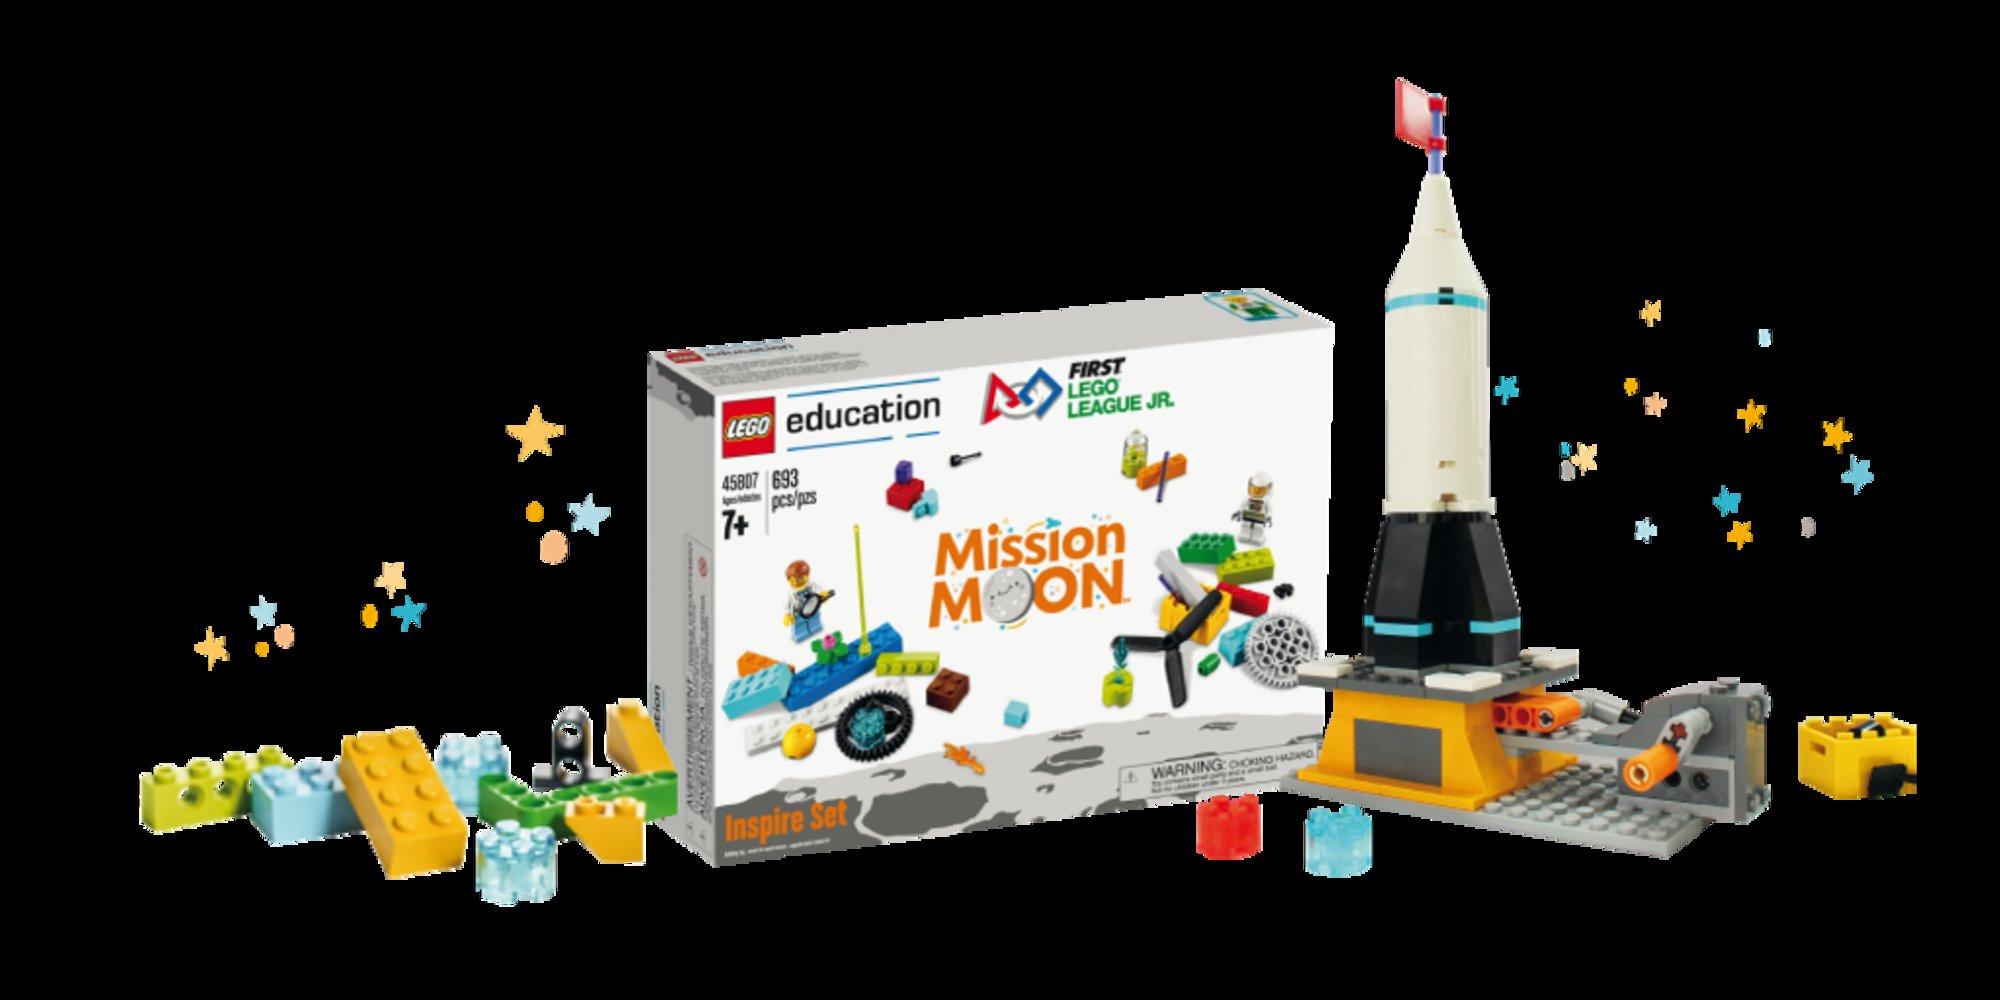 Mission Moon Inspire Set